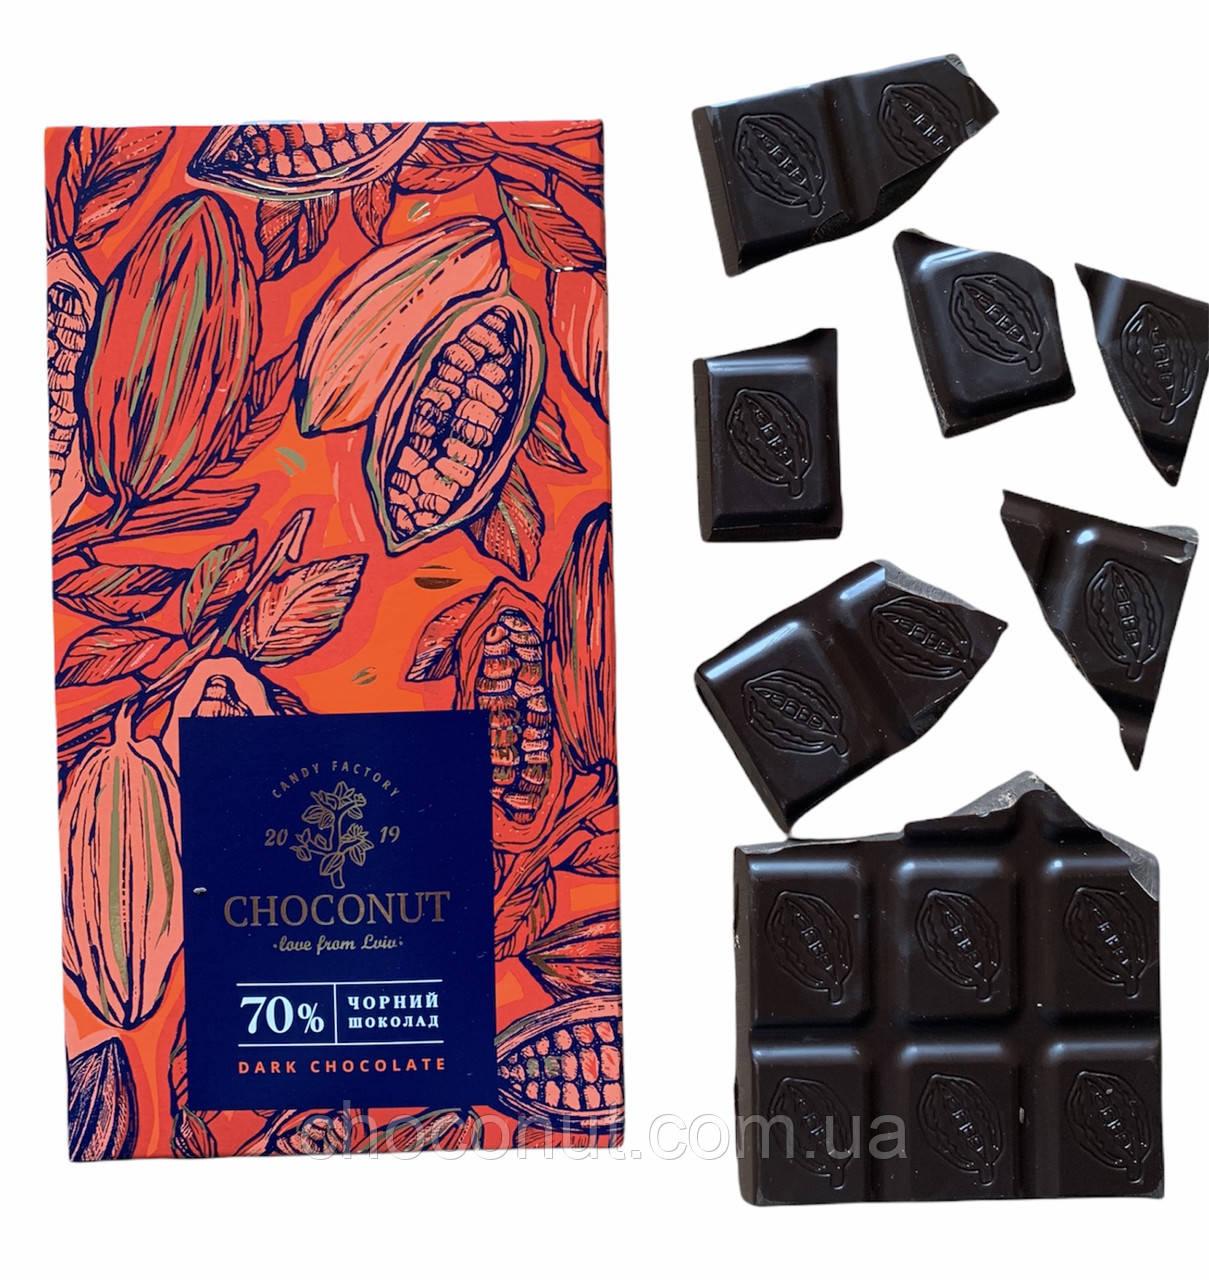 Шоколадка «Чорний шоколад 70%» ТМ Шоконат